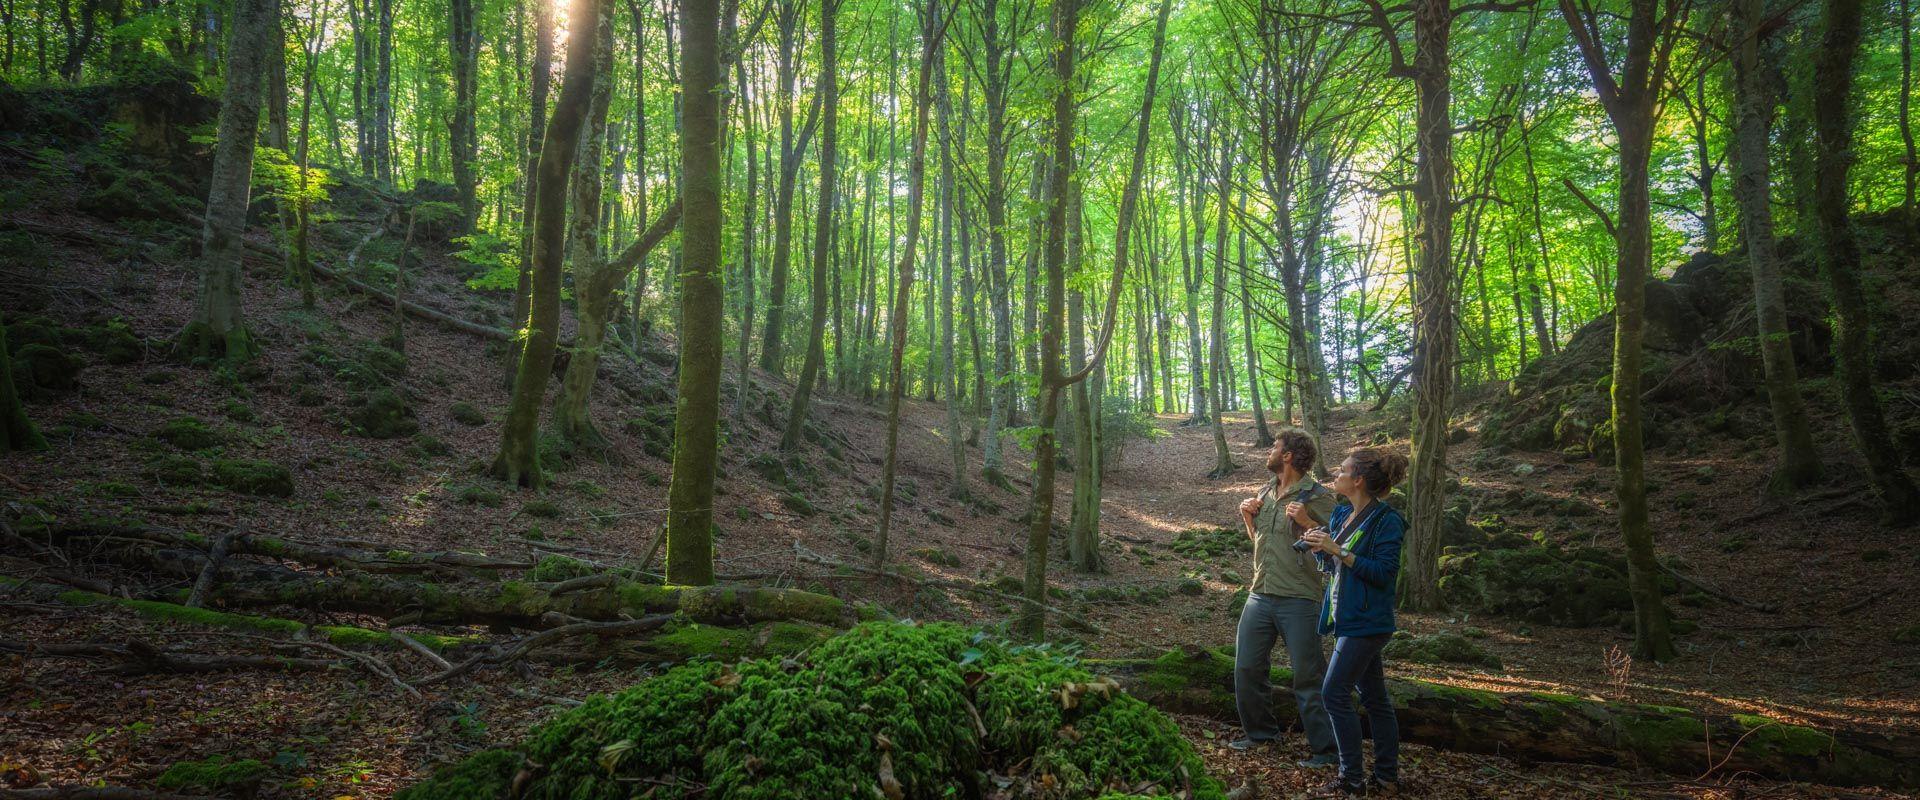 Slider Visiting the forests - 6